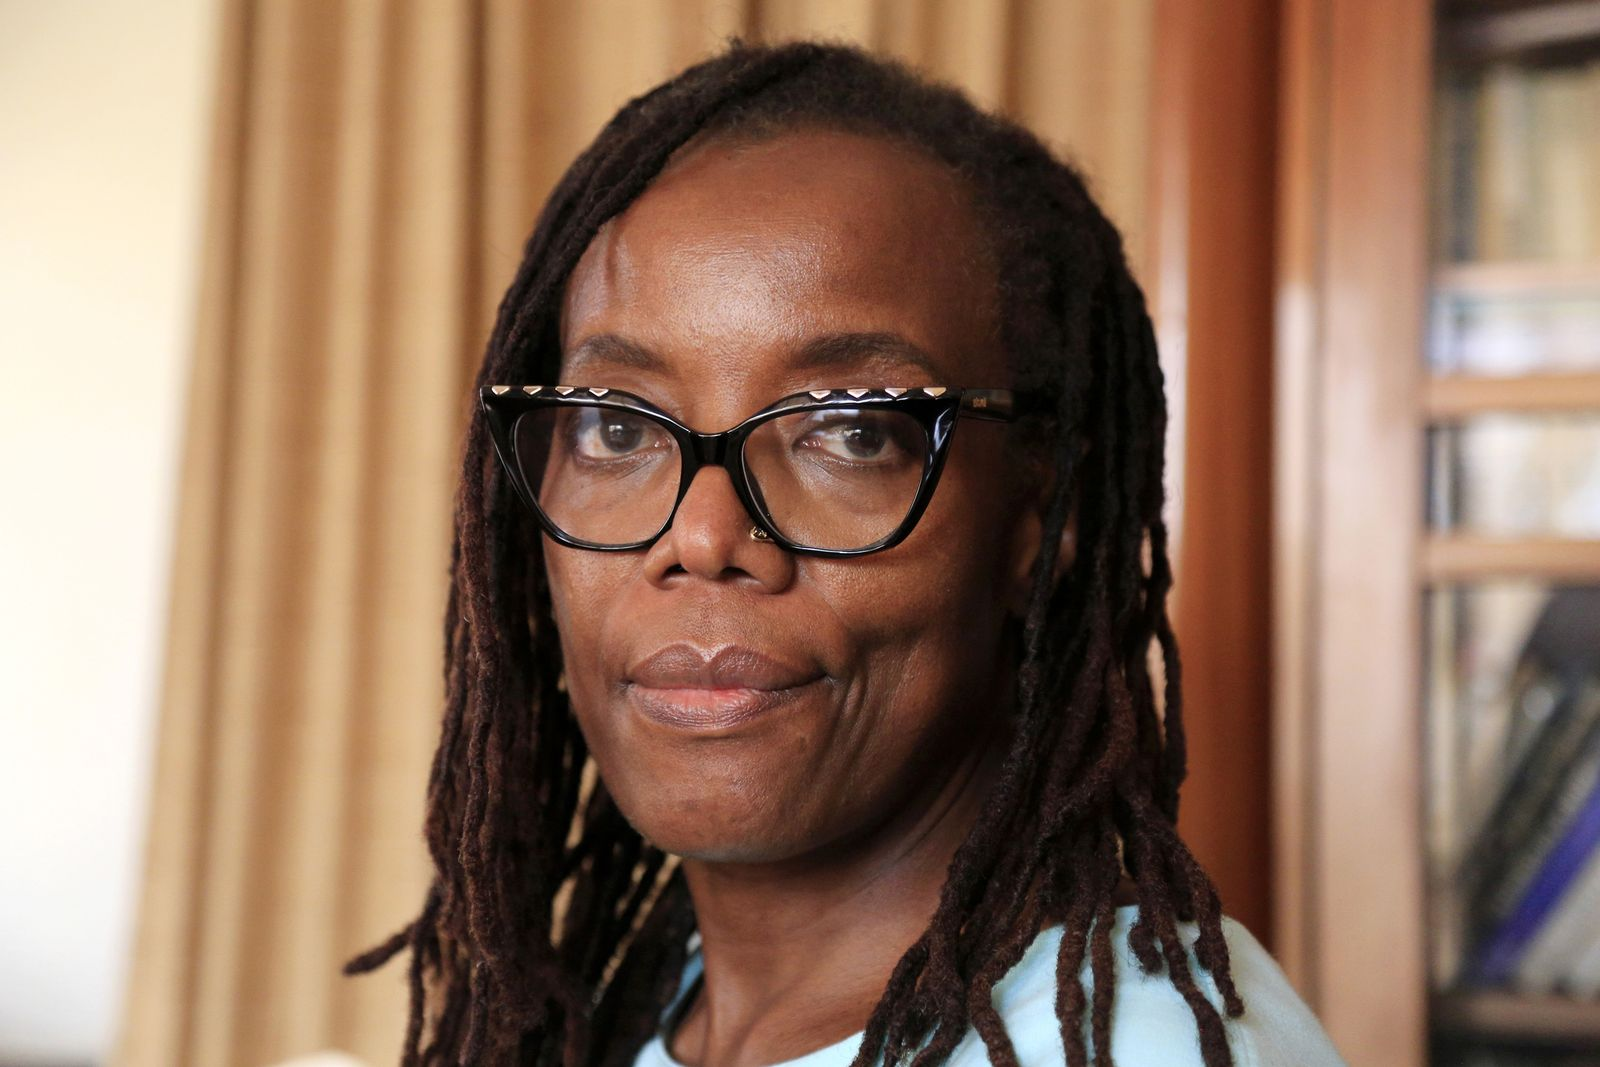 Tsitsi Dangarembga receives 2021 Peace Prize of the German Book Trade